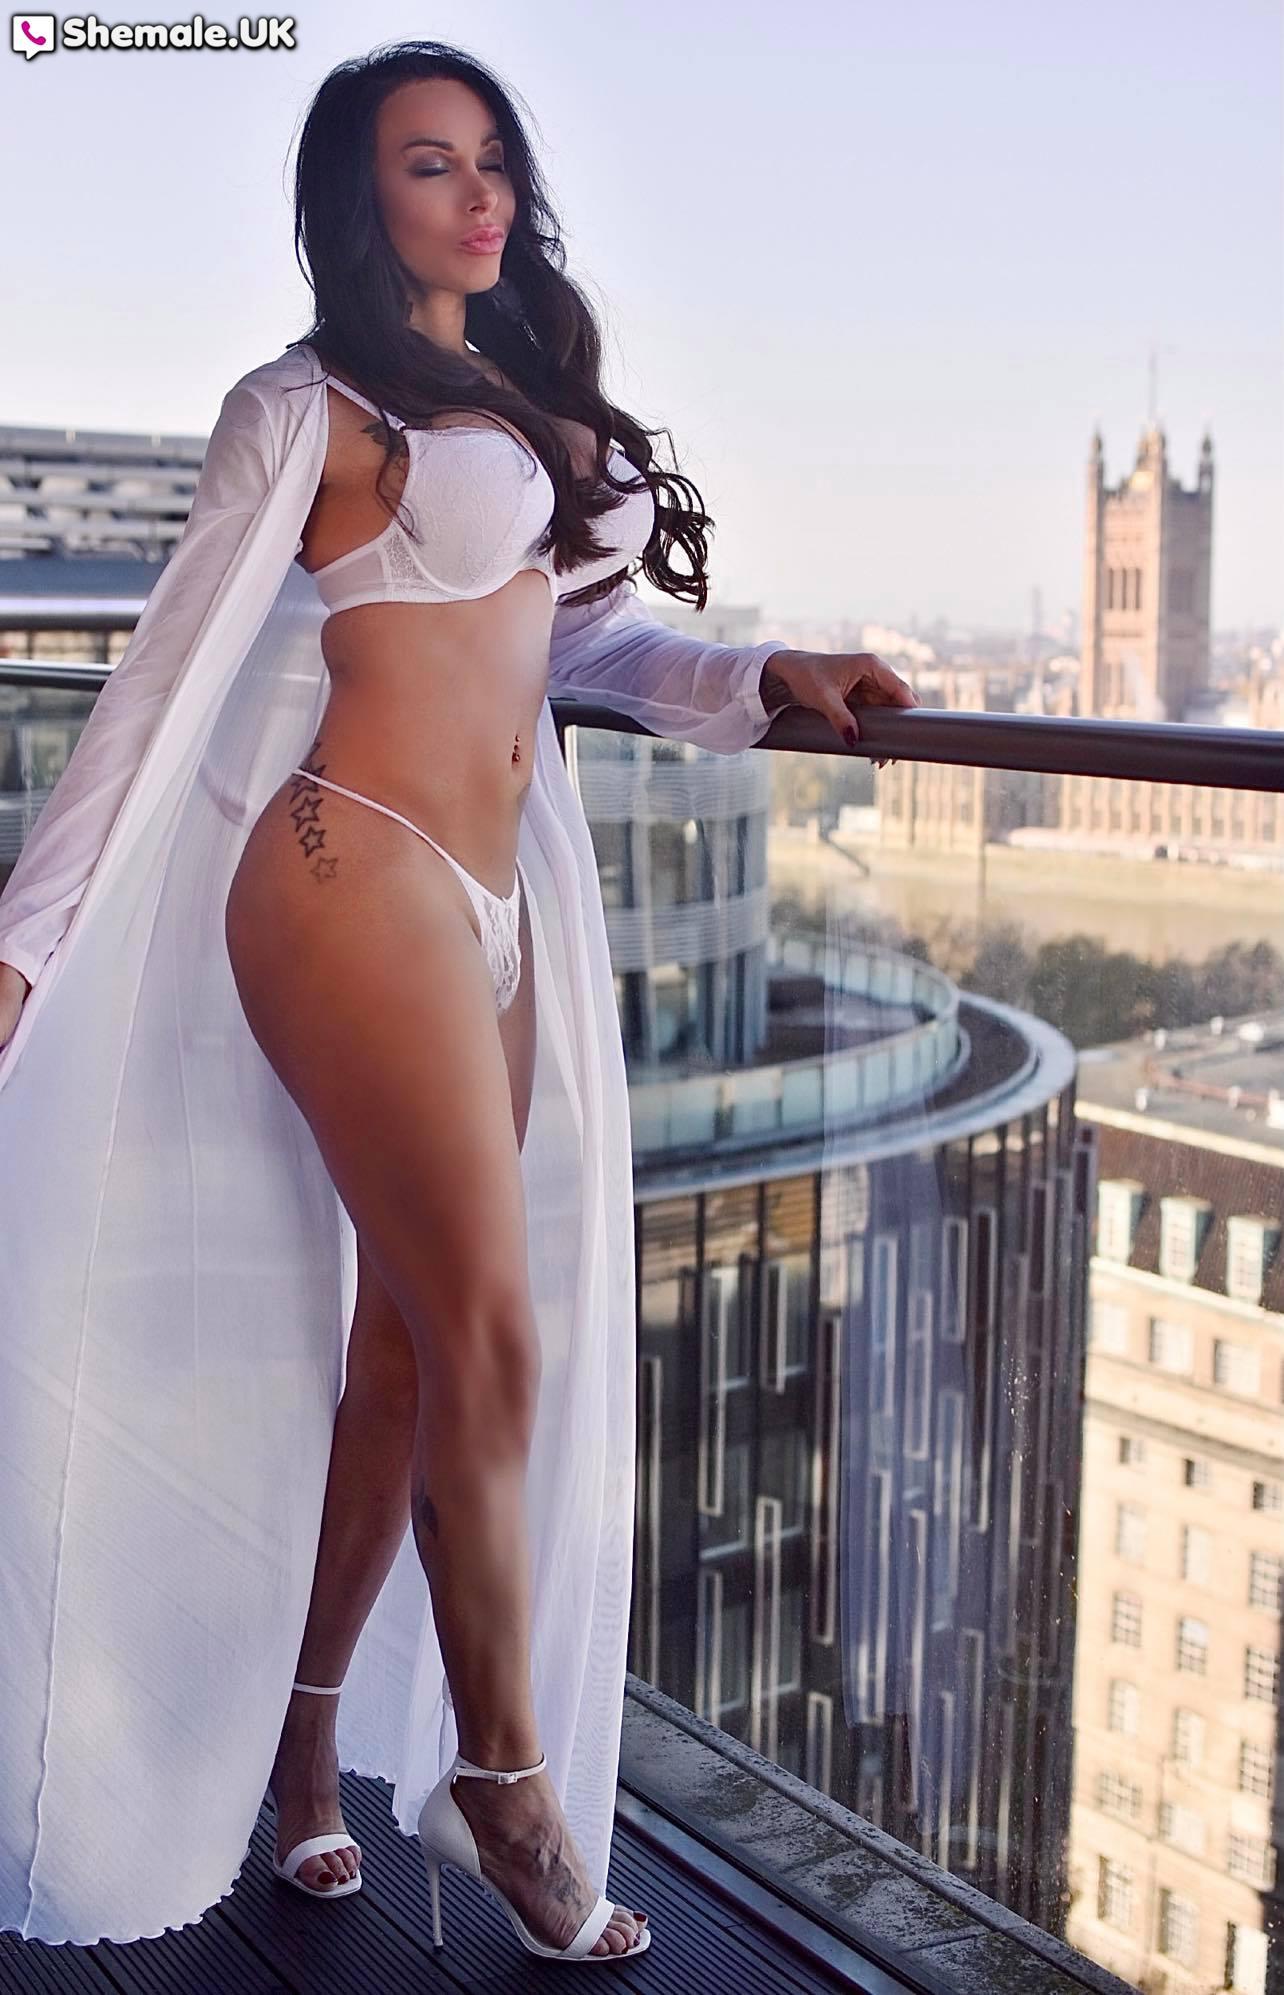 Fetish sex dating app gps in City of London